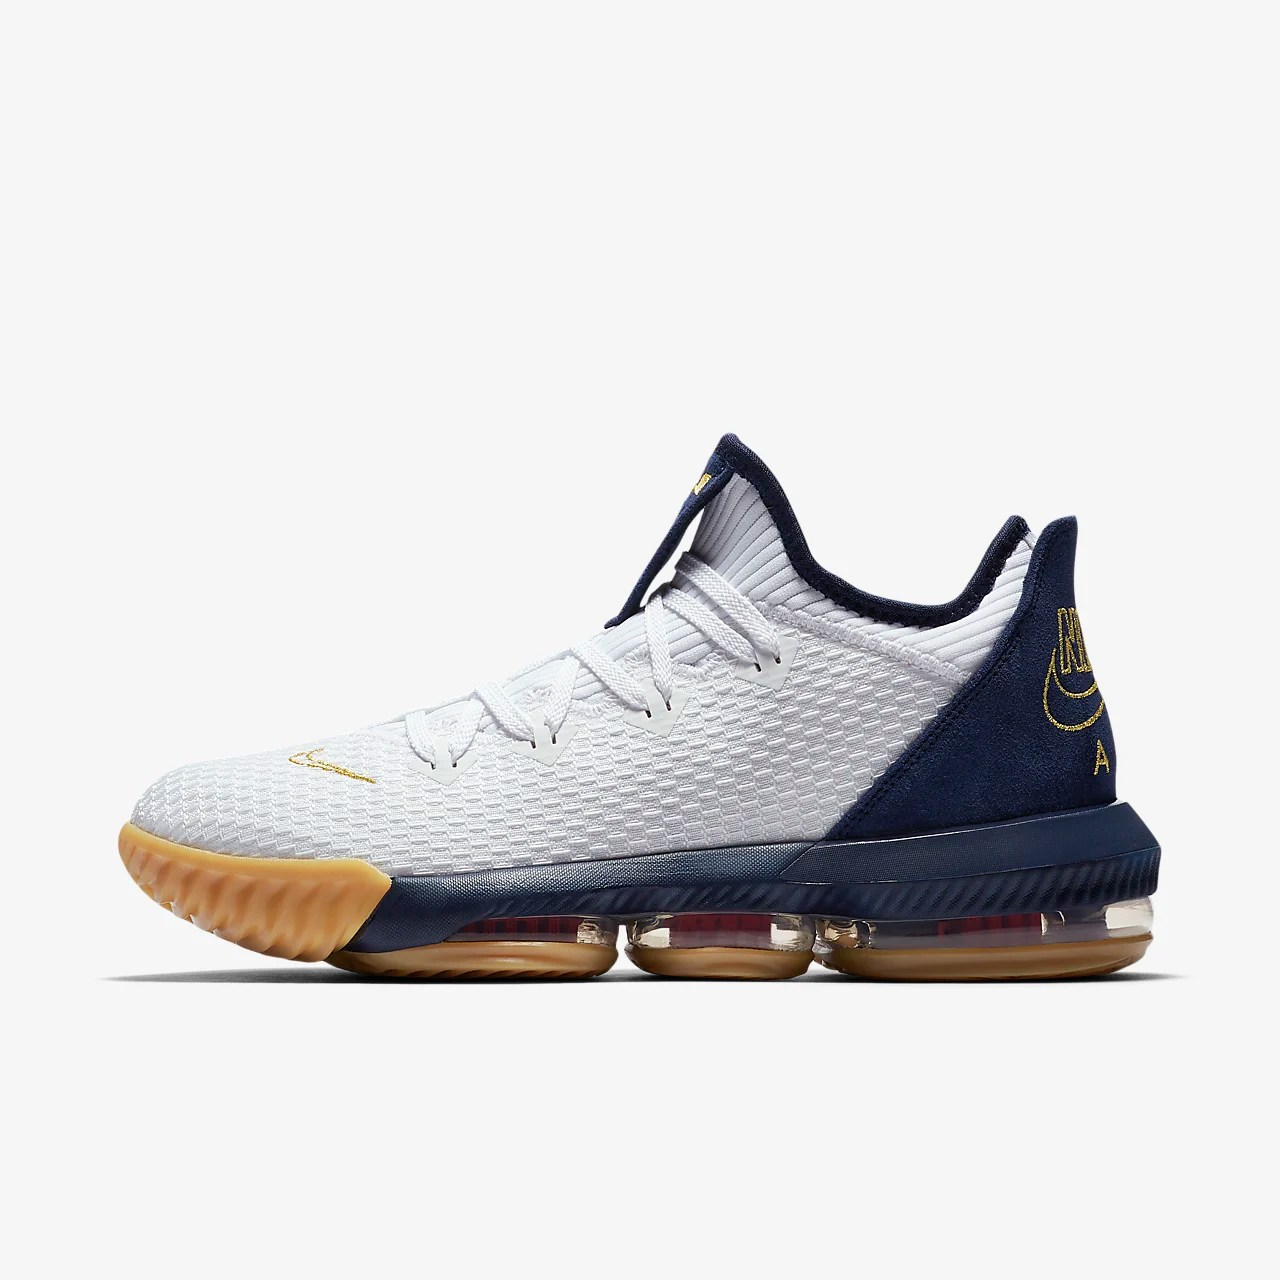 LeBron XVI Low EP 男子籃球鞋-耐克(Nike)中國官網